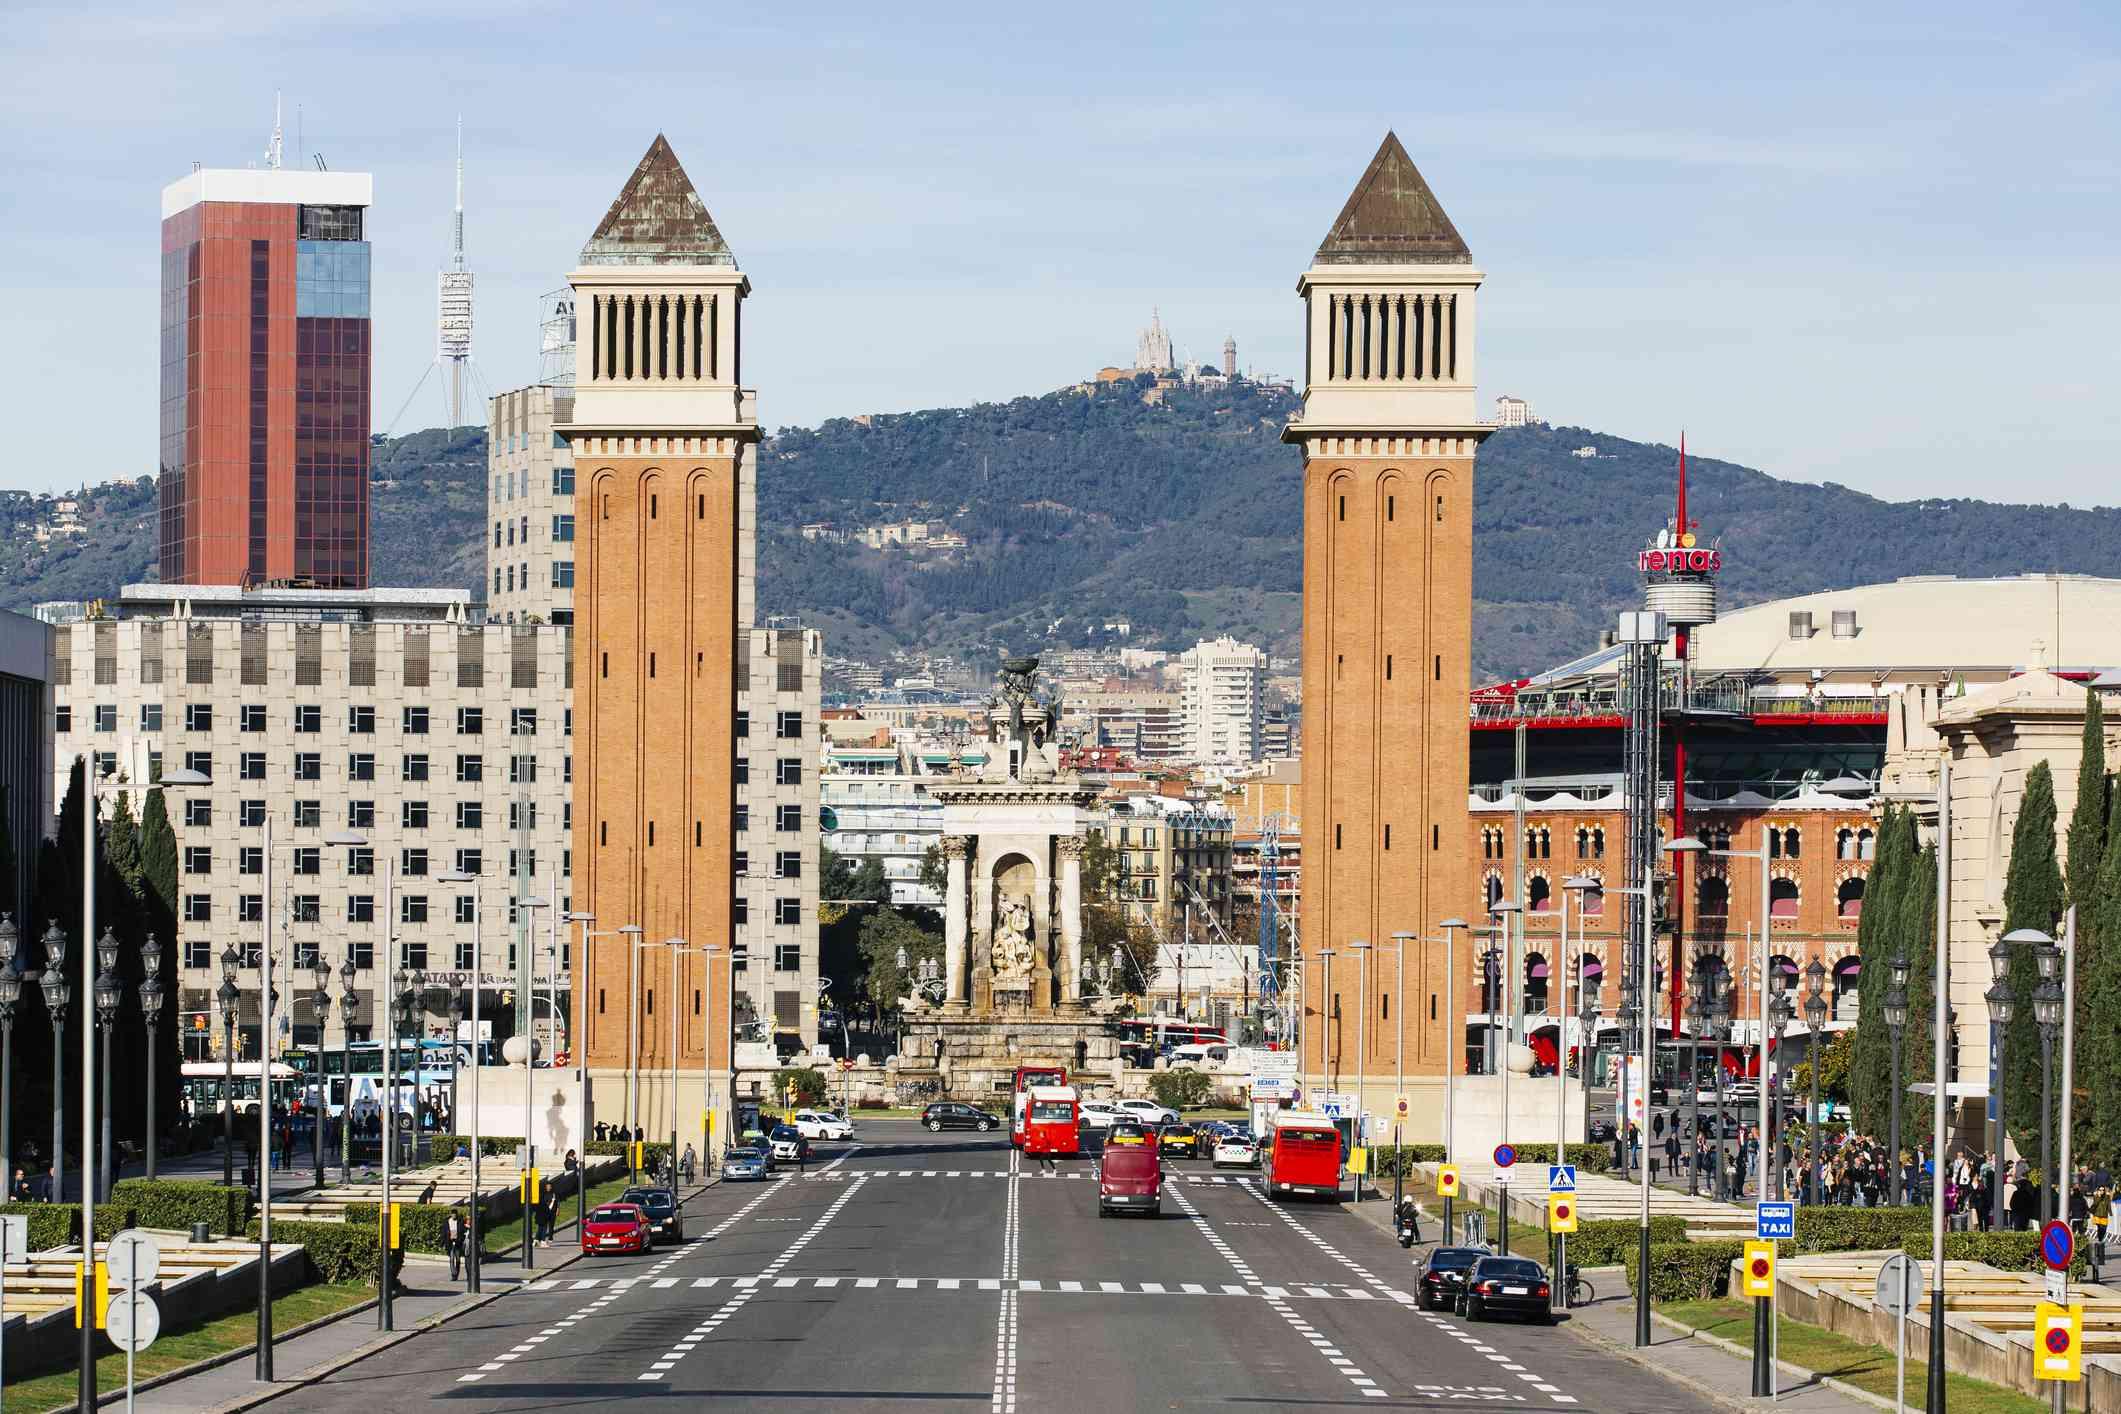 Venetian Towers and Plaza de Espana, Barcelona, Catalonia, Spain